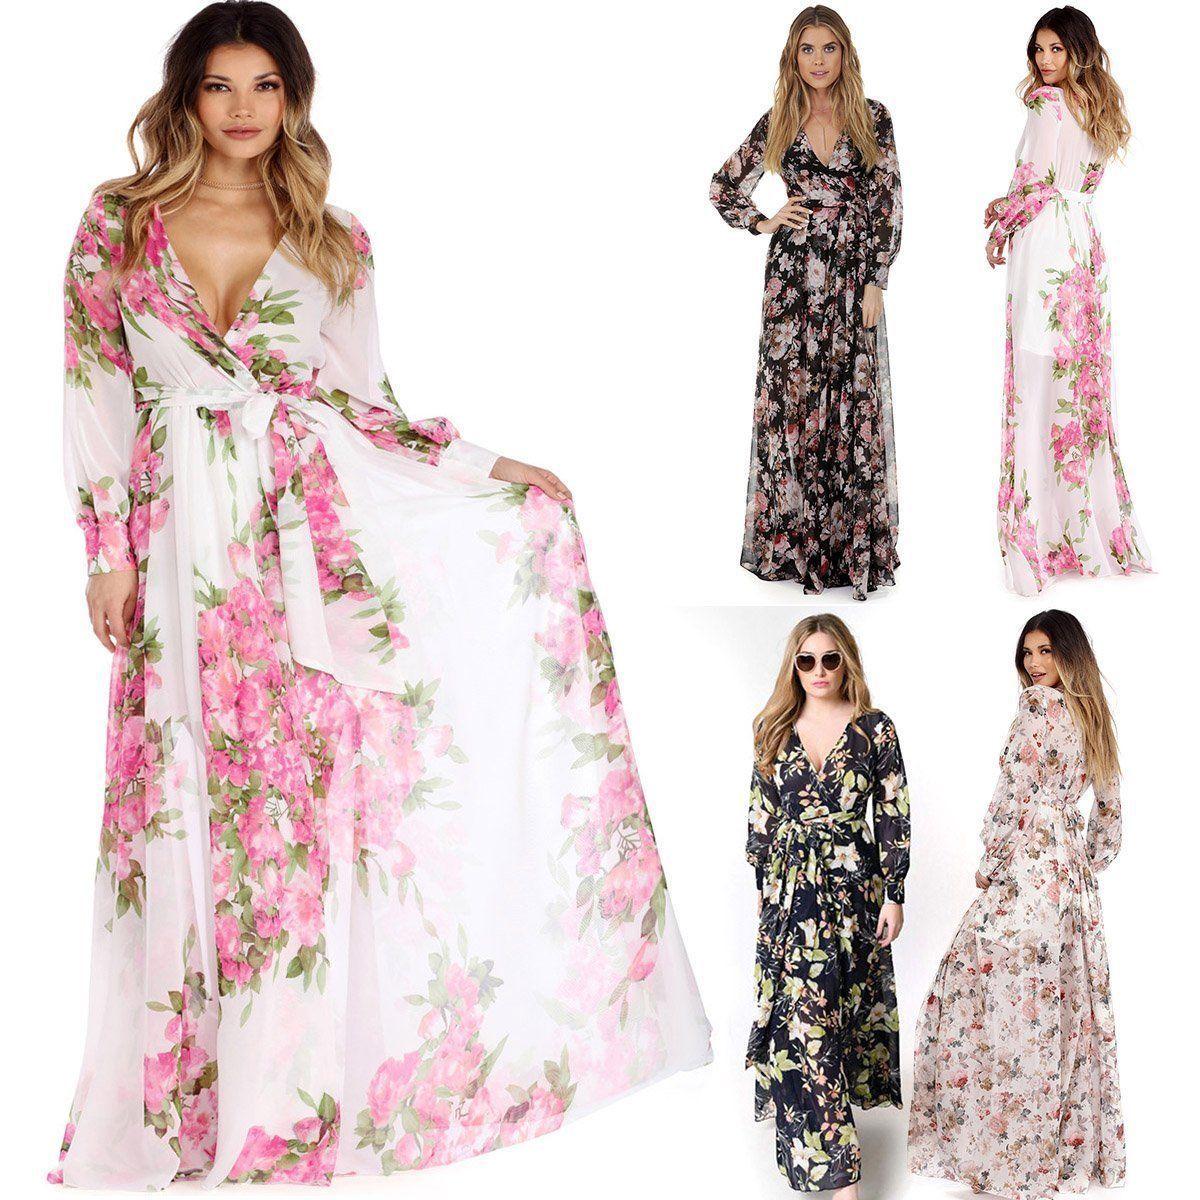 Full Lantern Sleeve Floral Printed Bownot Front Vestido Boho Women Party Evening Slim Long  Maxi Dress Clothing Plus Size M-3XL